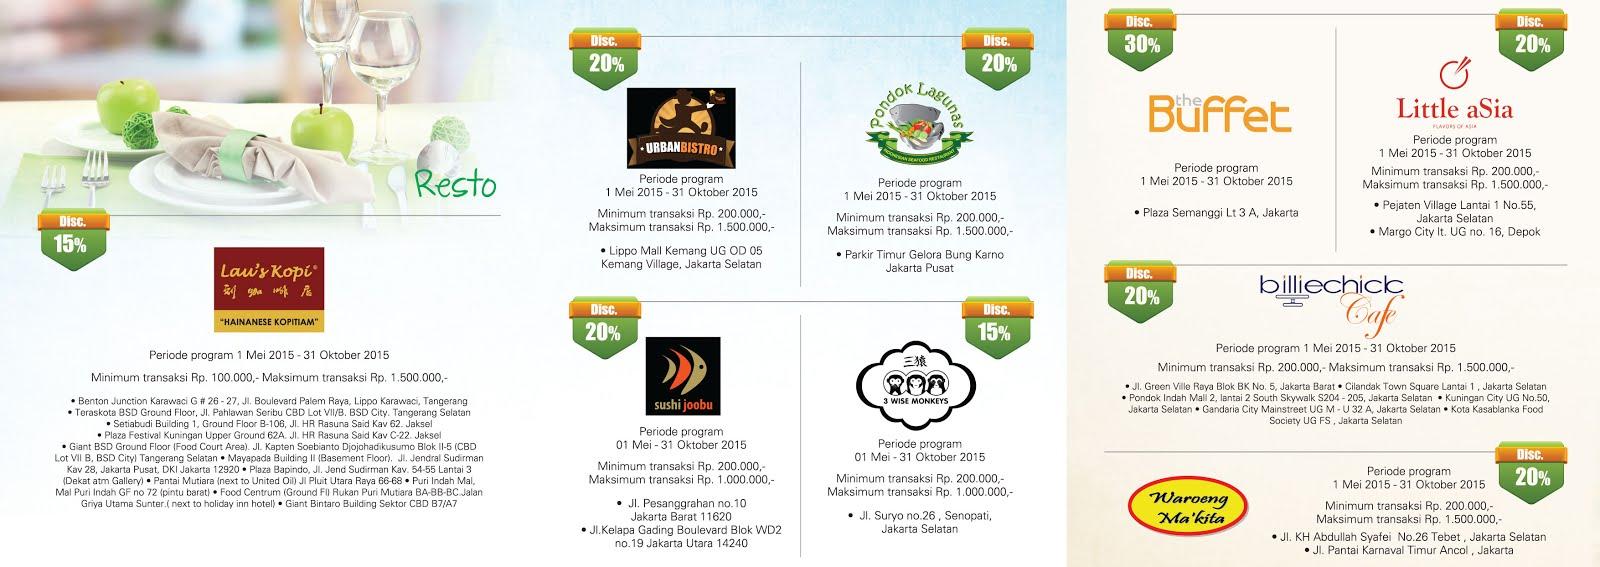 Promo Kuliner Hasanah Card